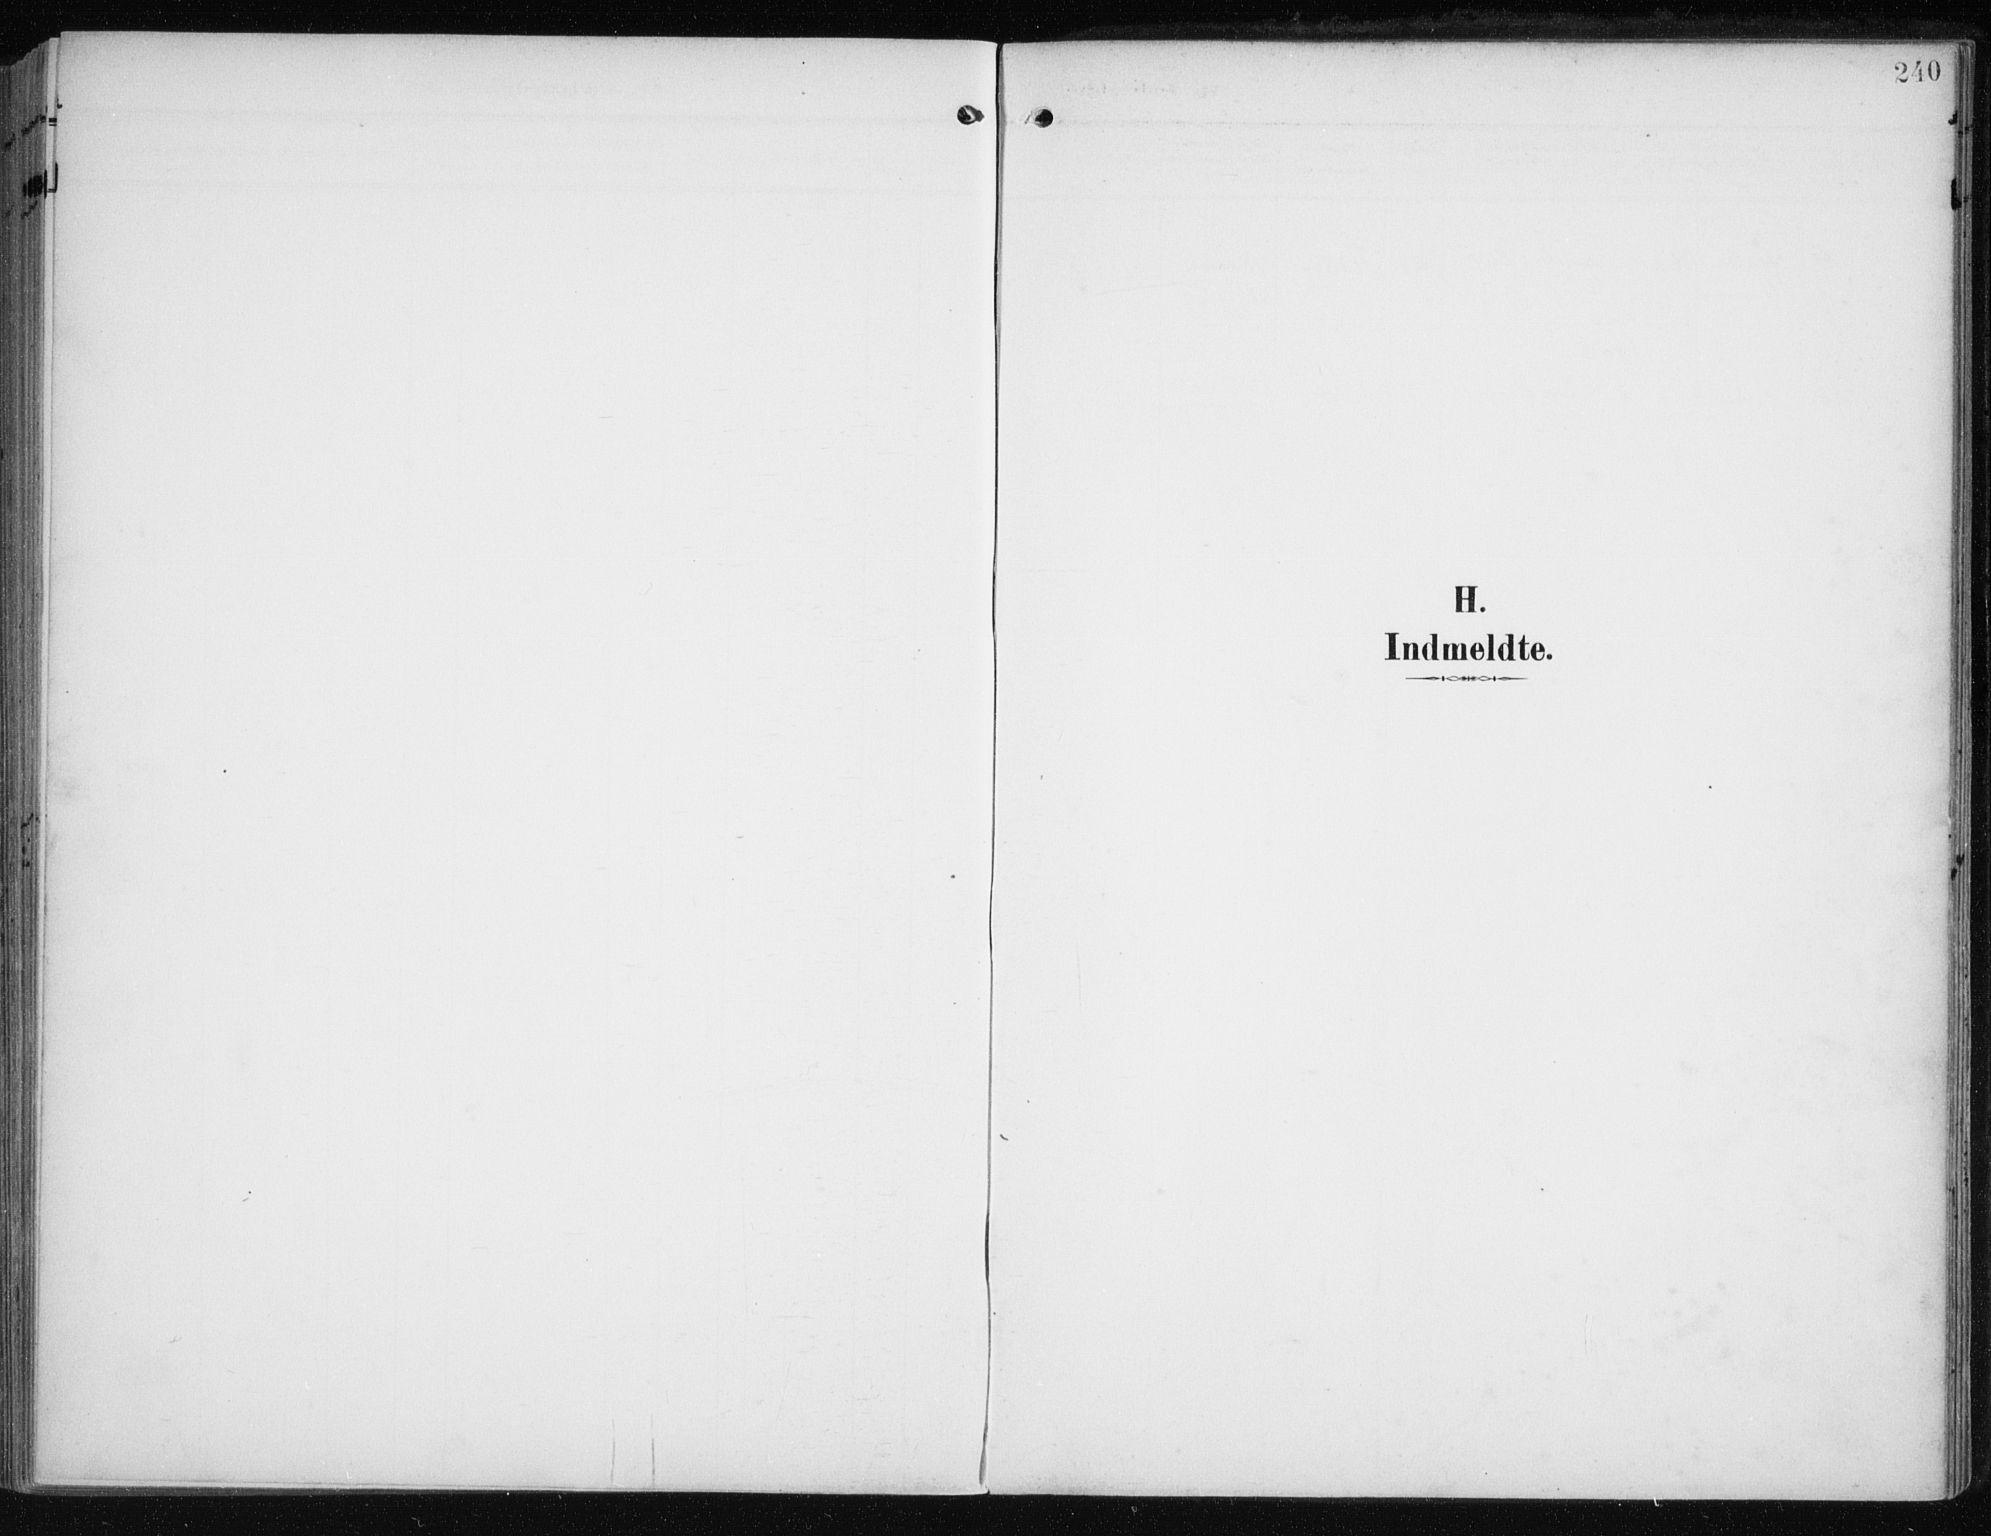 SATØ, Måsøy sokneprestkontor, H/Ha/L0009kirke: Ministerialbok nr. 9, 1903-1914, s. 240